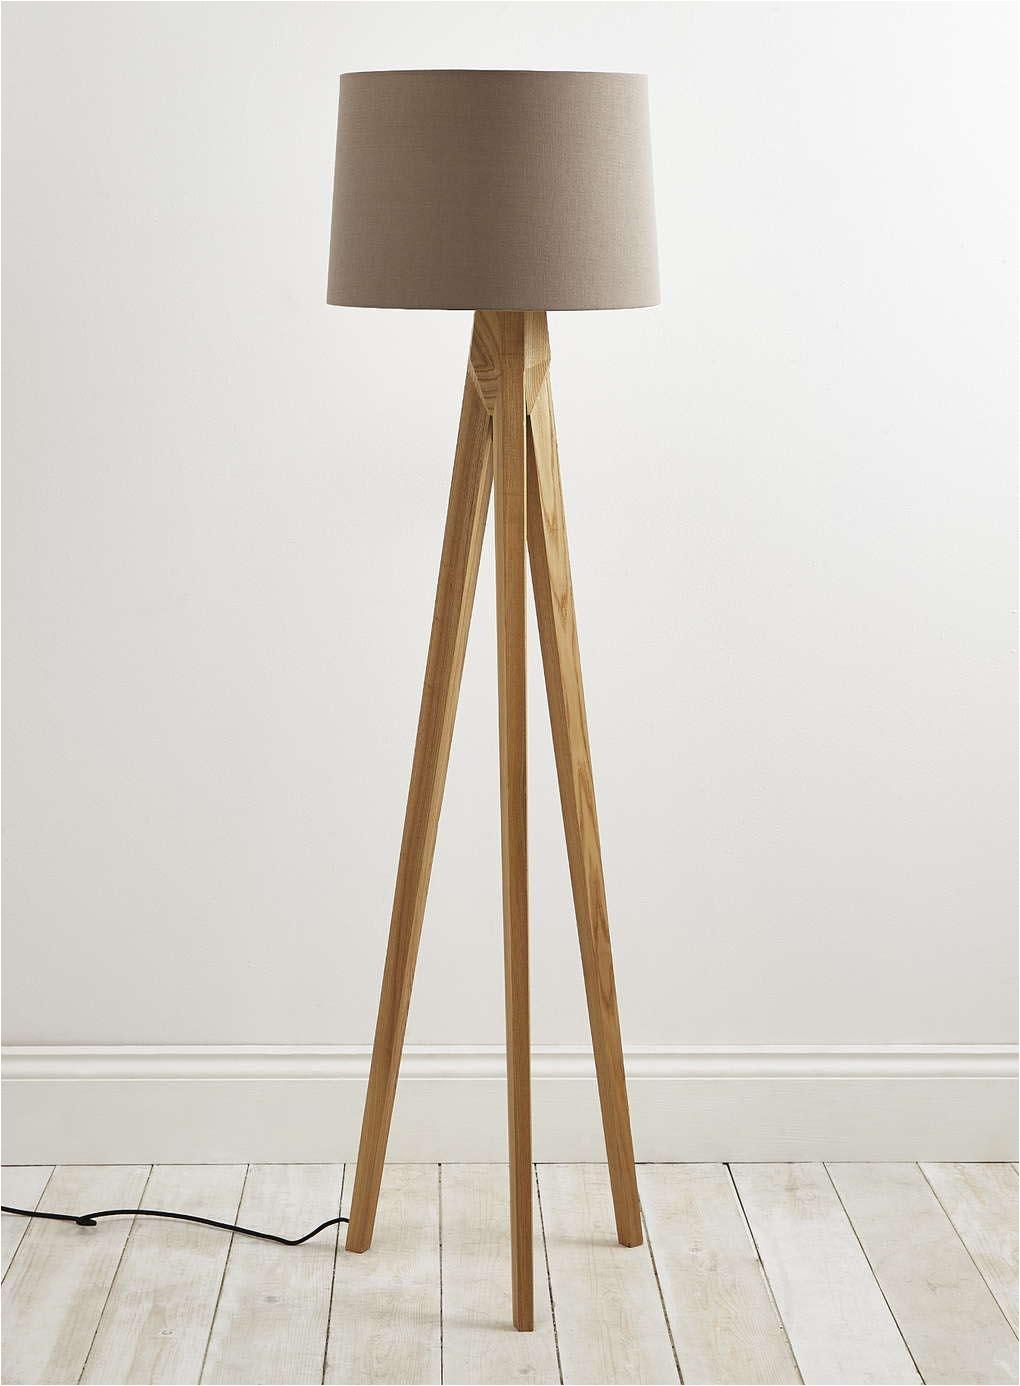 Photographer S TriPod Floor Lamp Amazon TriPod Floor Lamp Wooden Legs Light Fixtures Design Ideas TriPod